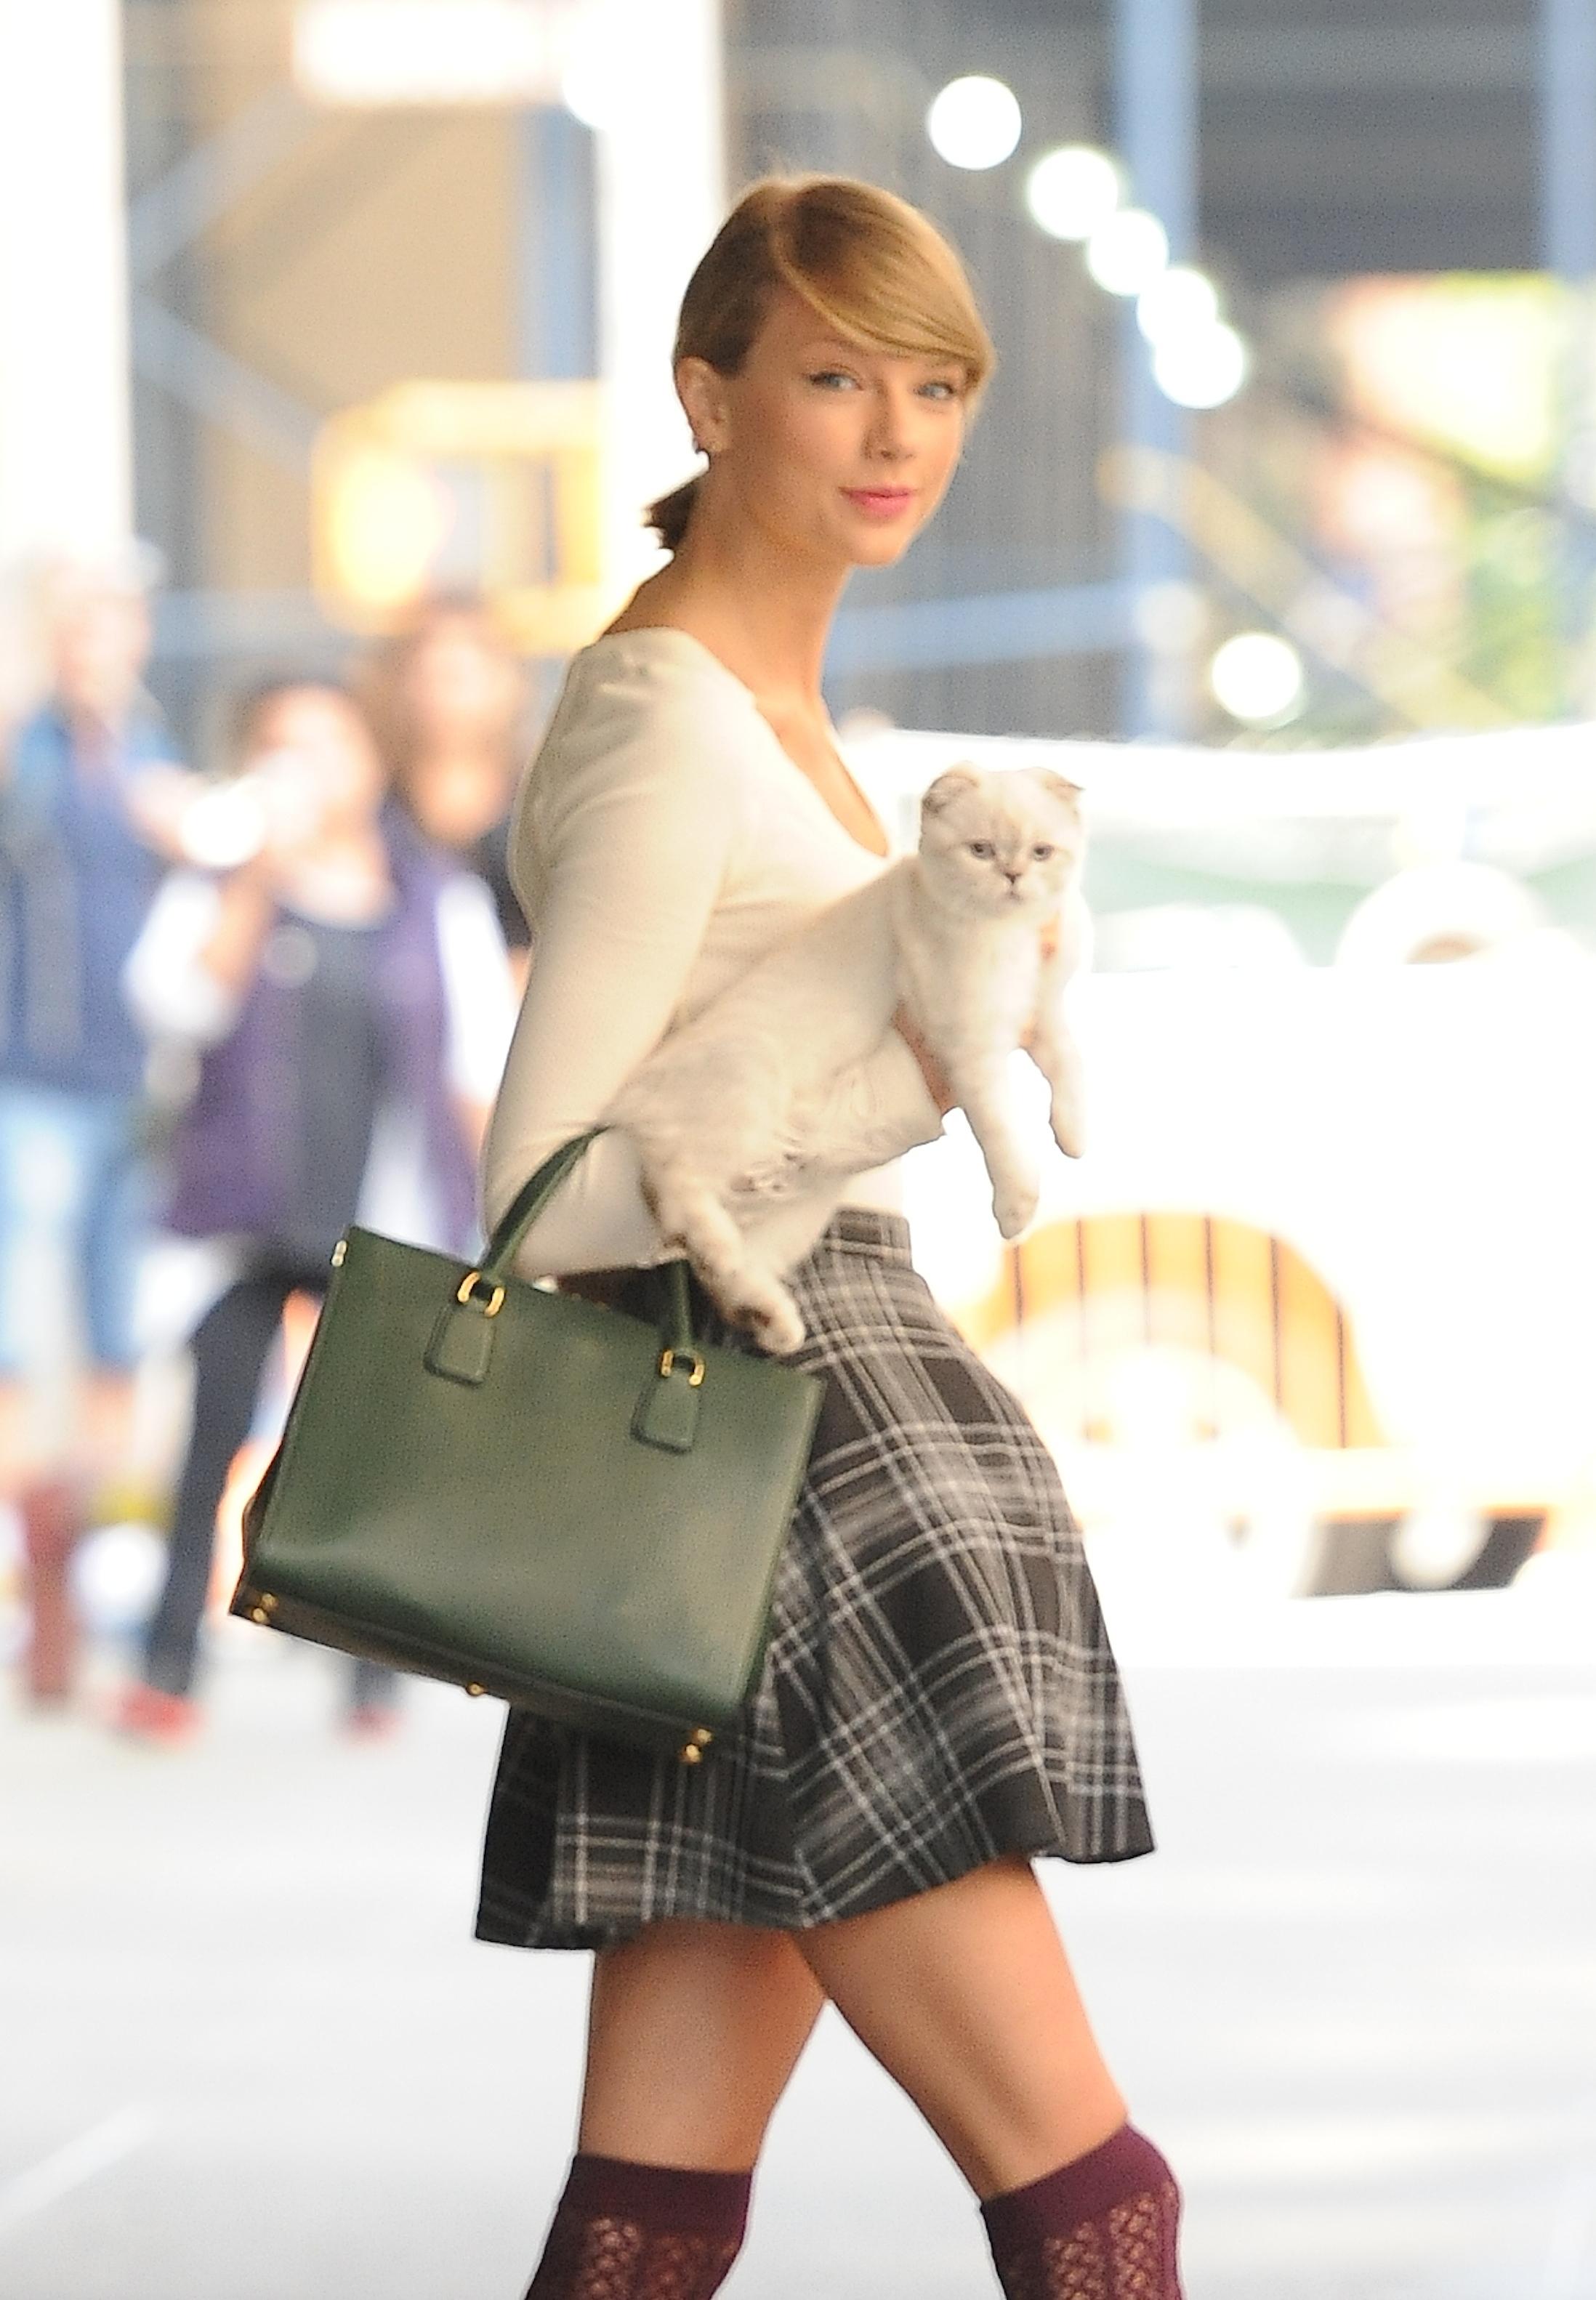 Mariska Hargitay Met Taylor Swift's Cat Olivia Benson | Time.com